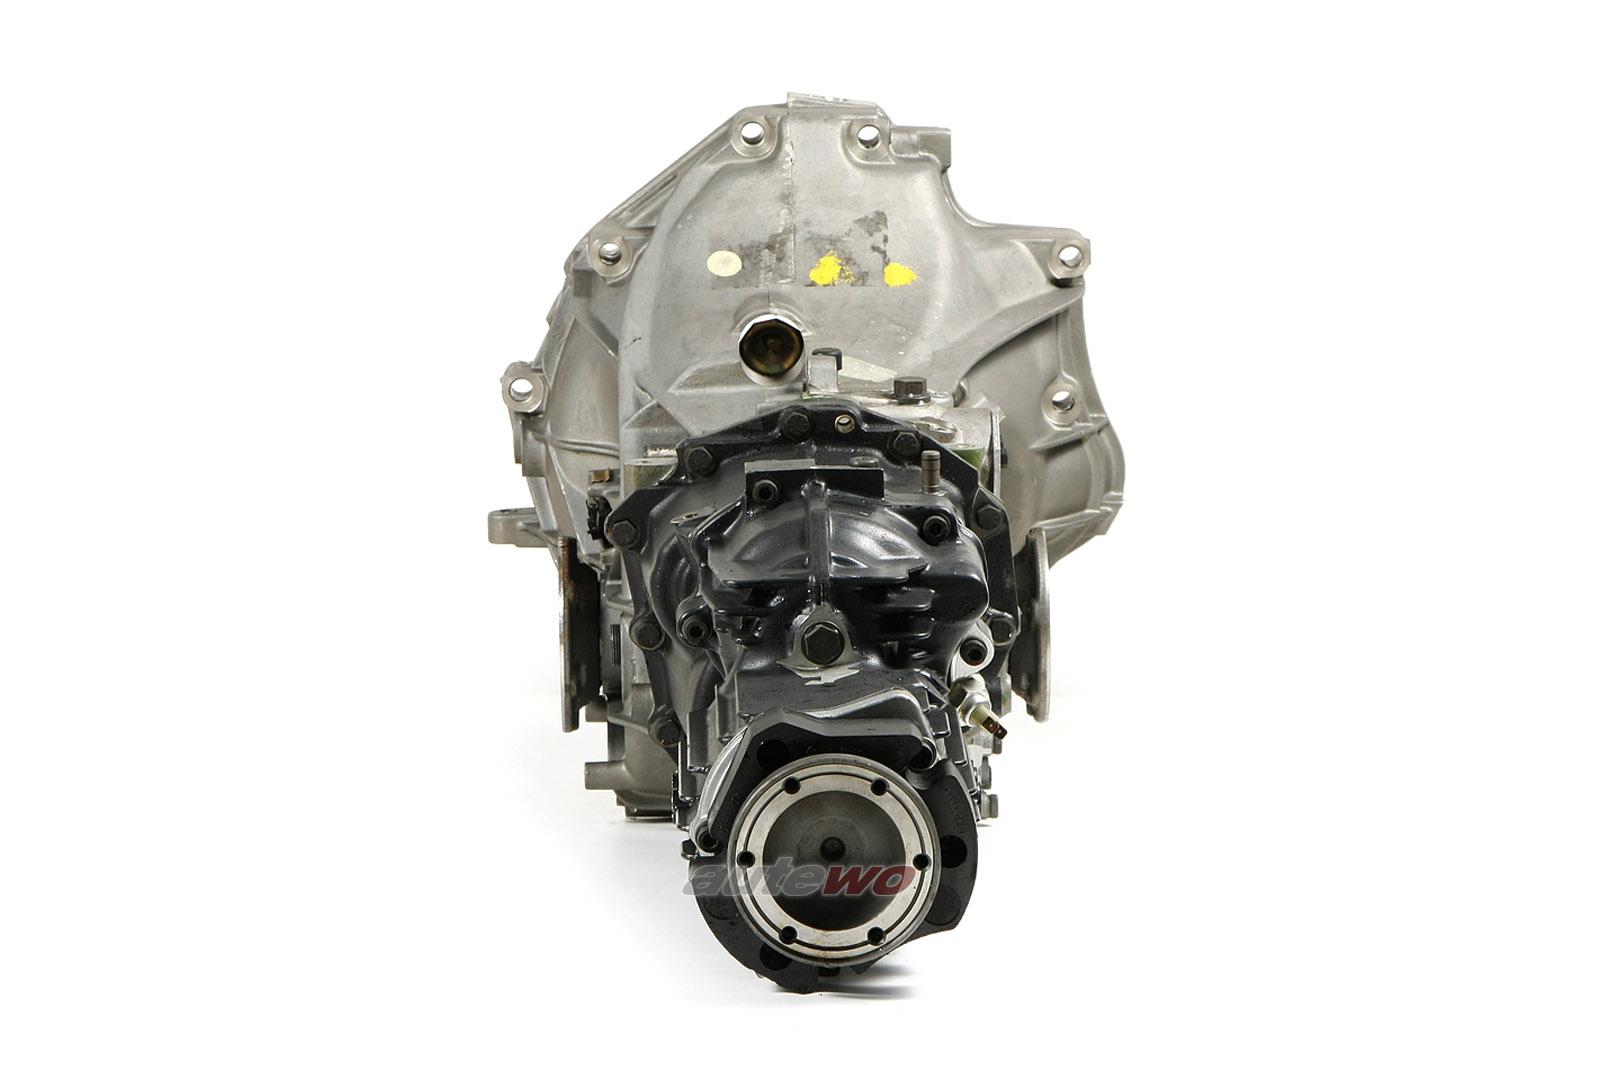 016300052PNEU Audi 100/200 Typ 44 2.2l 5-Gang-Getriebe Quattro AOB 14051